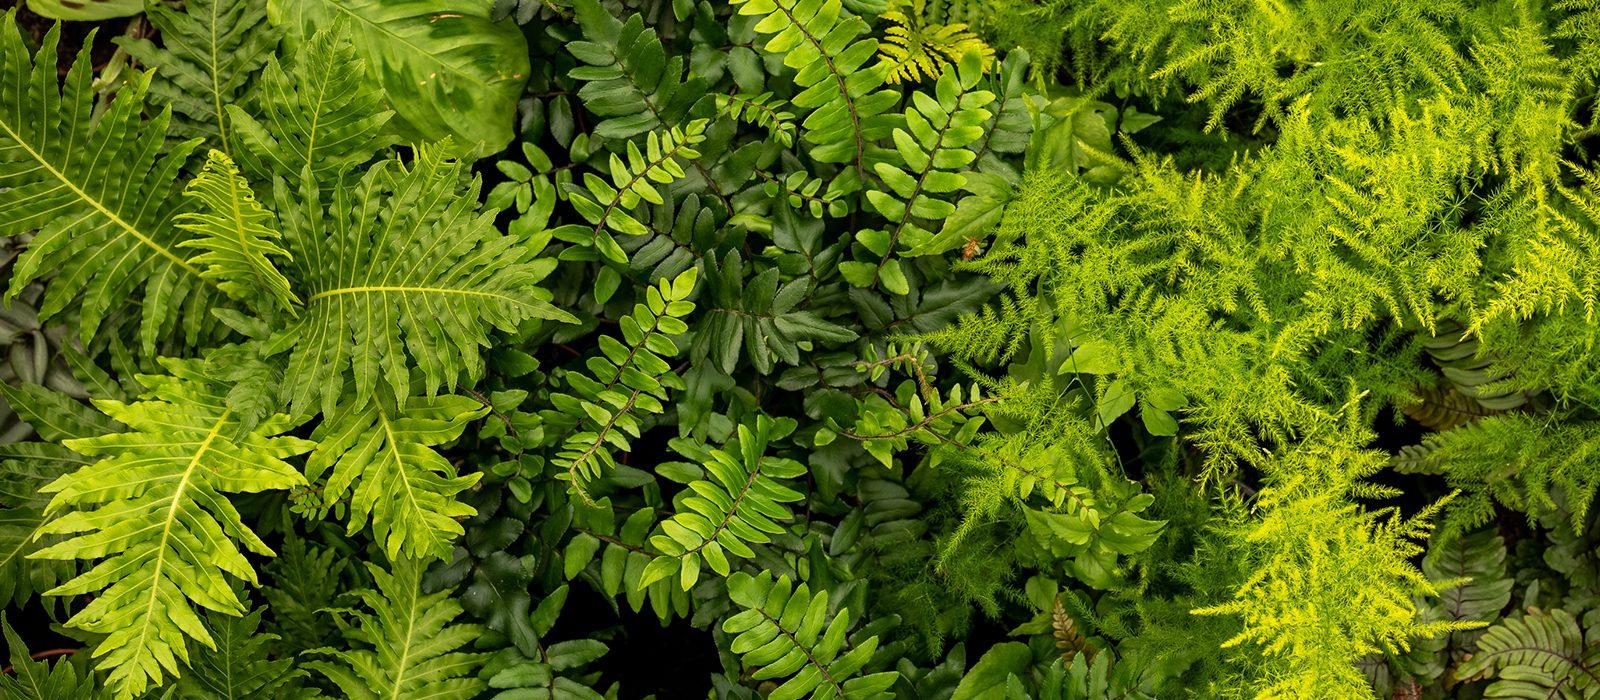 Yarnton Home & Garden, Kidlington, Oxford - Plants for Sale